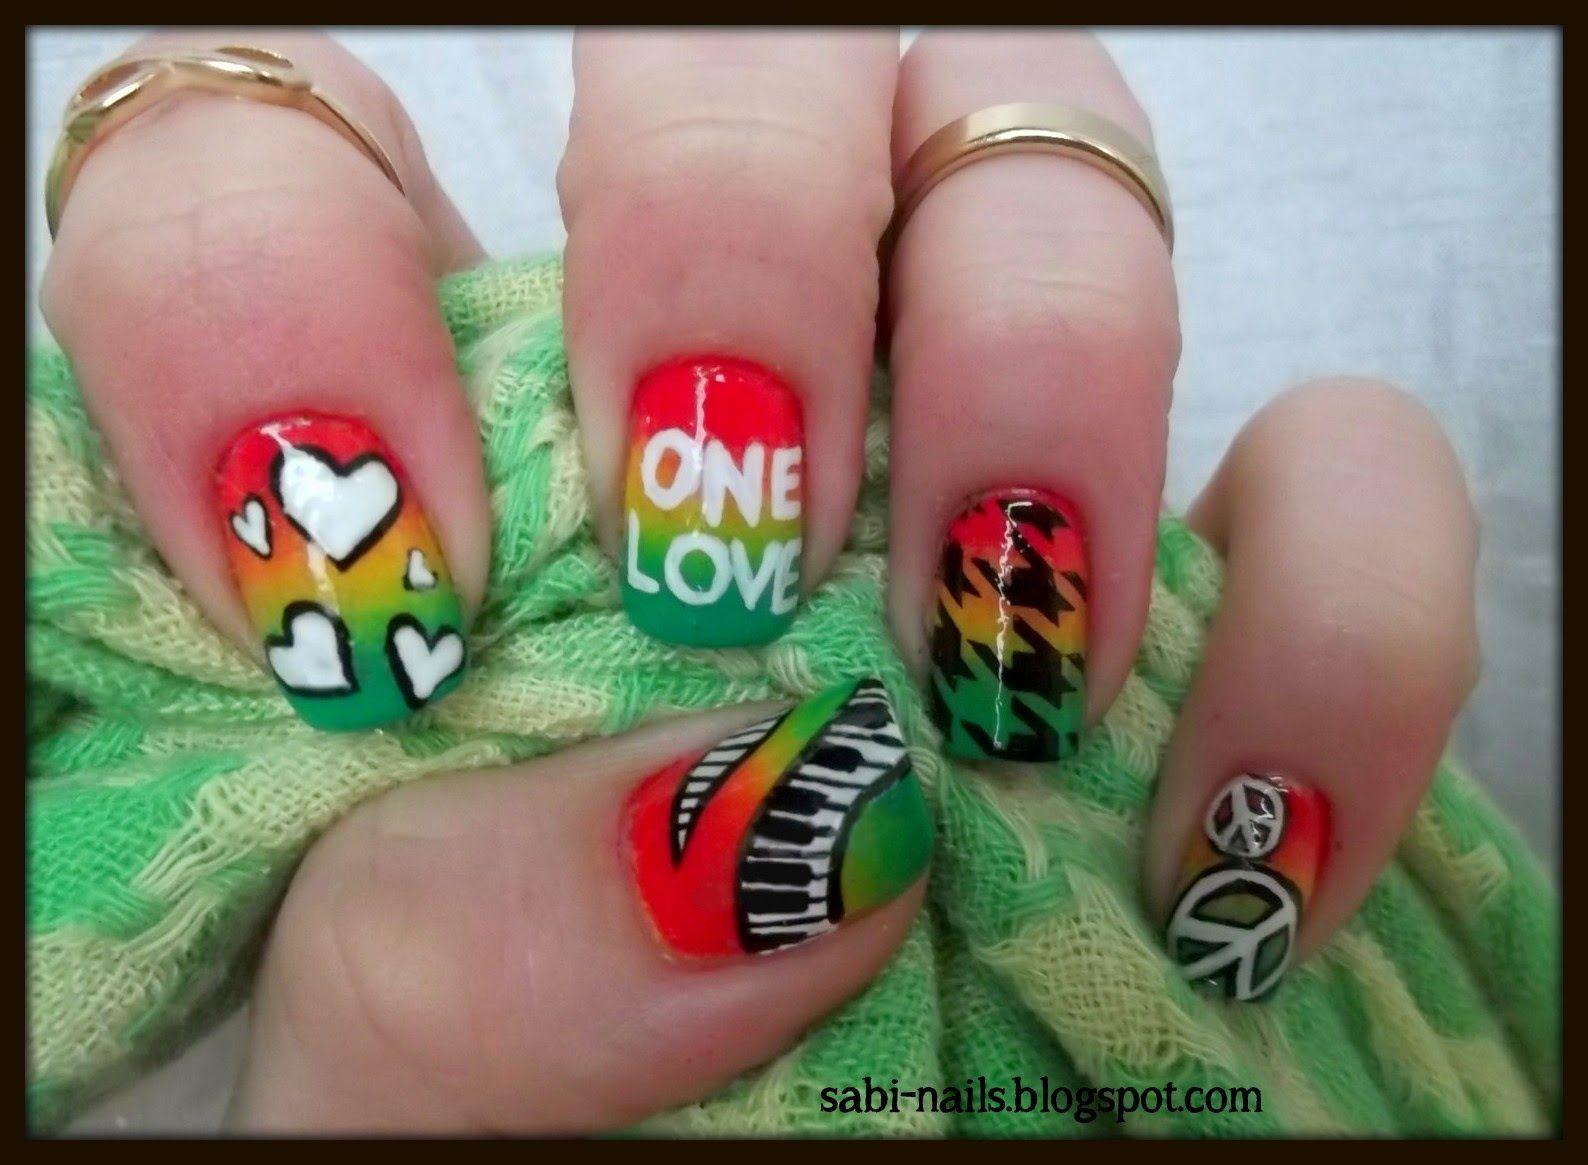 Sabi-nails: Reggae music nails + odrobina motywacji | Nail designs ...